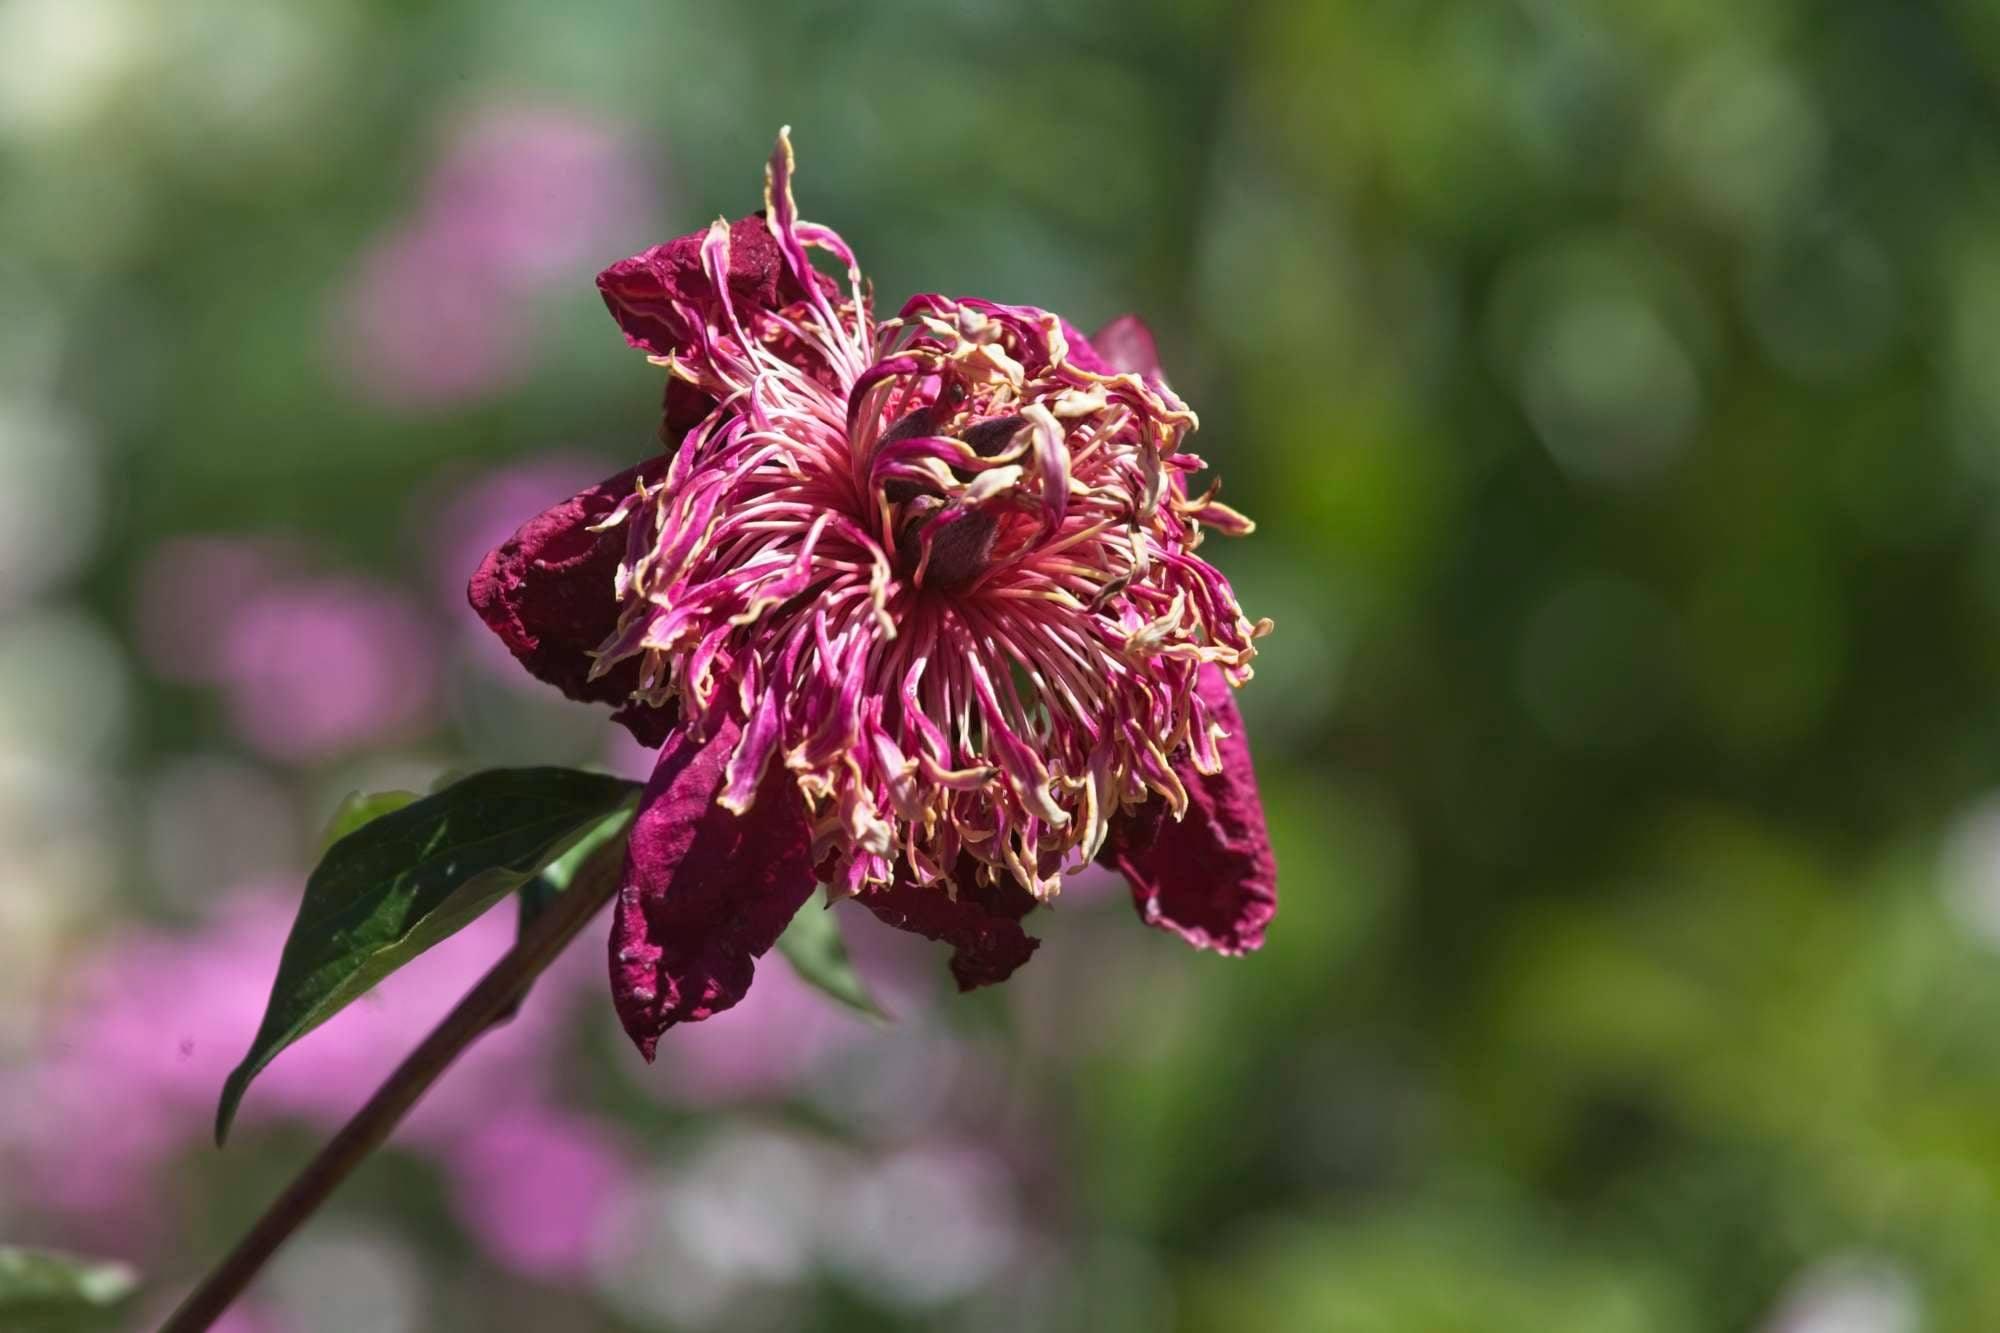 wilted pink flower